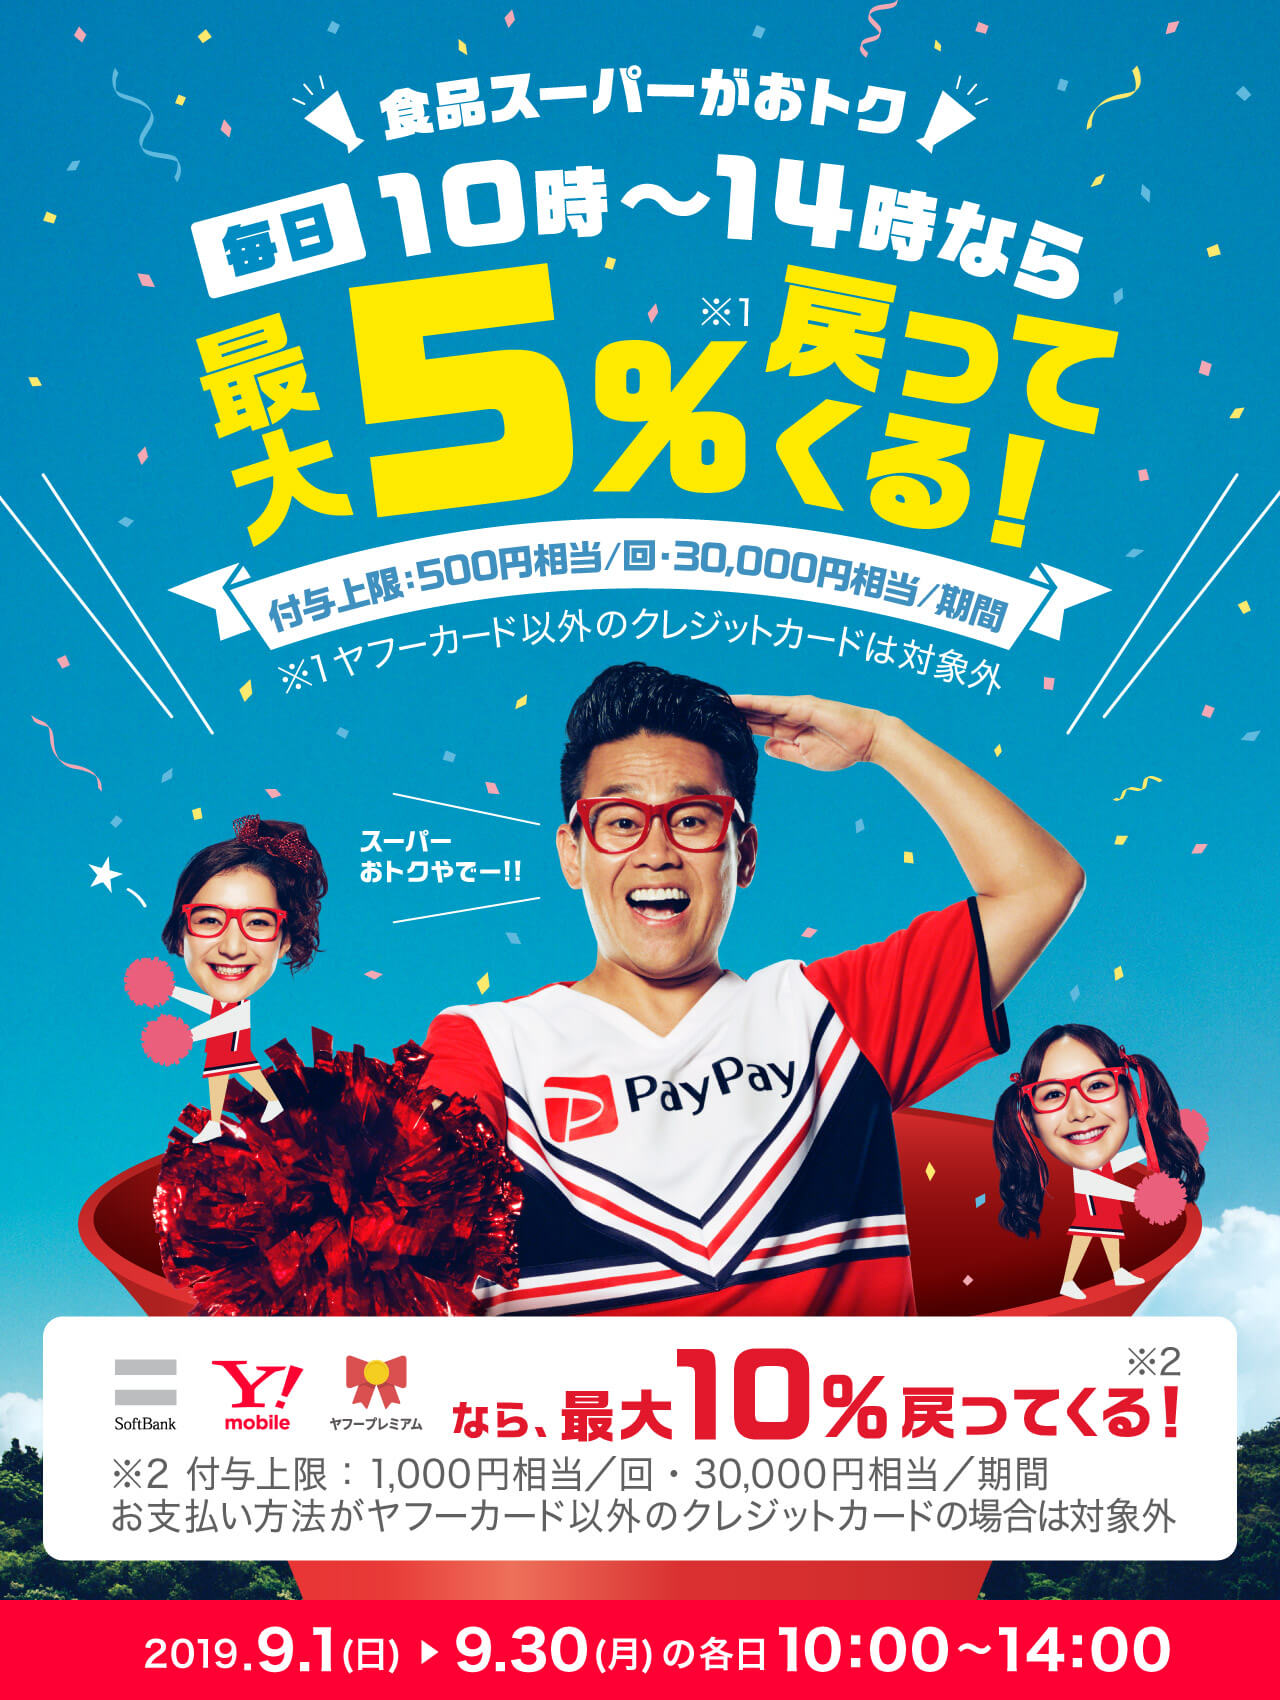 https://image.paypay.ne.jp/page/event/supermarket/images/img_mv_02.jpg